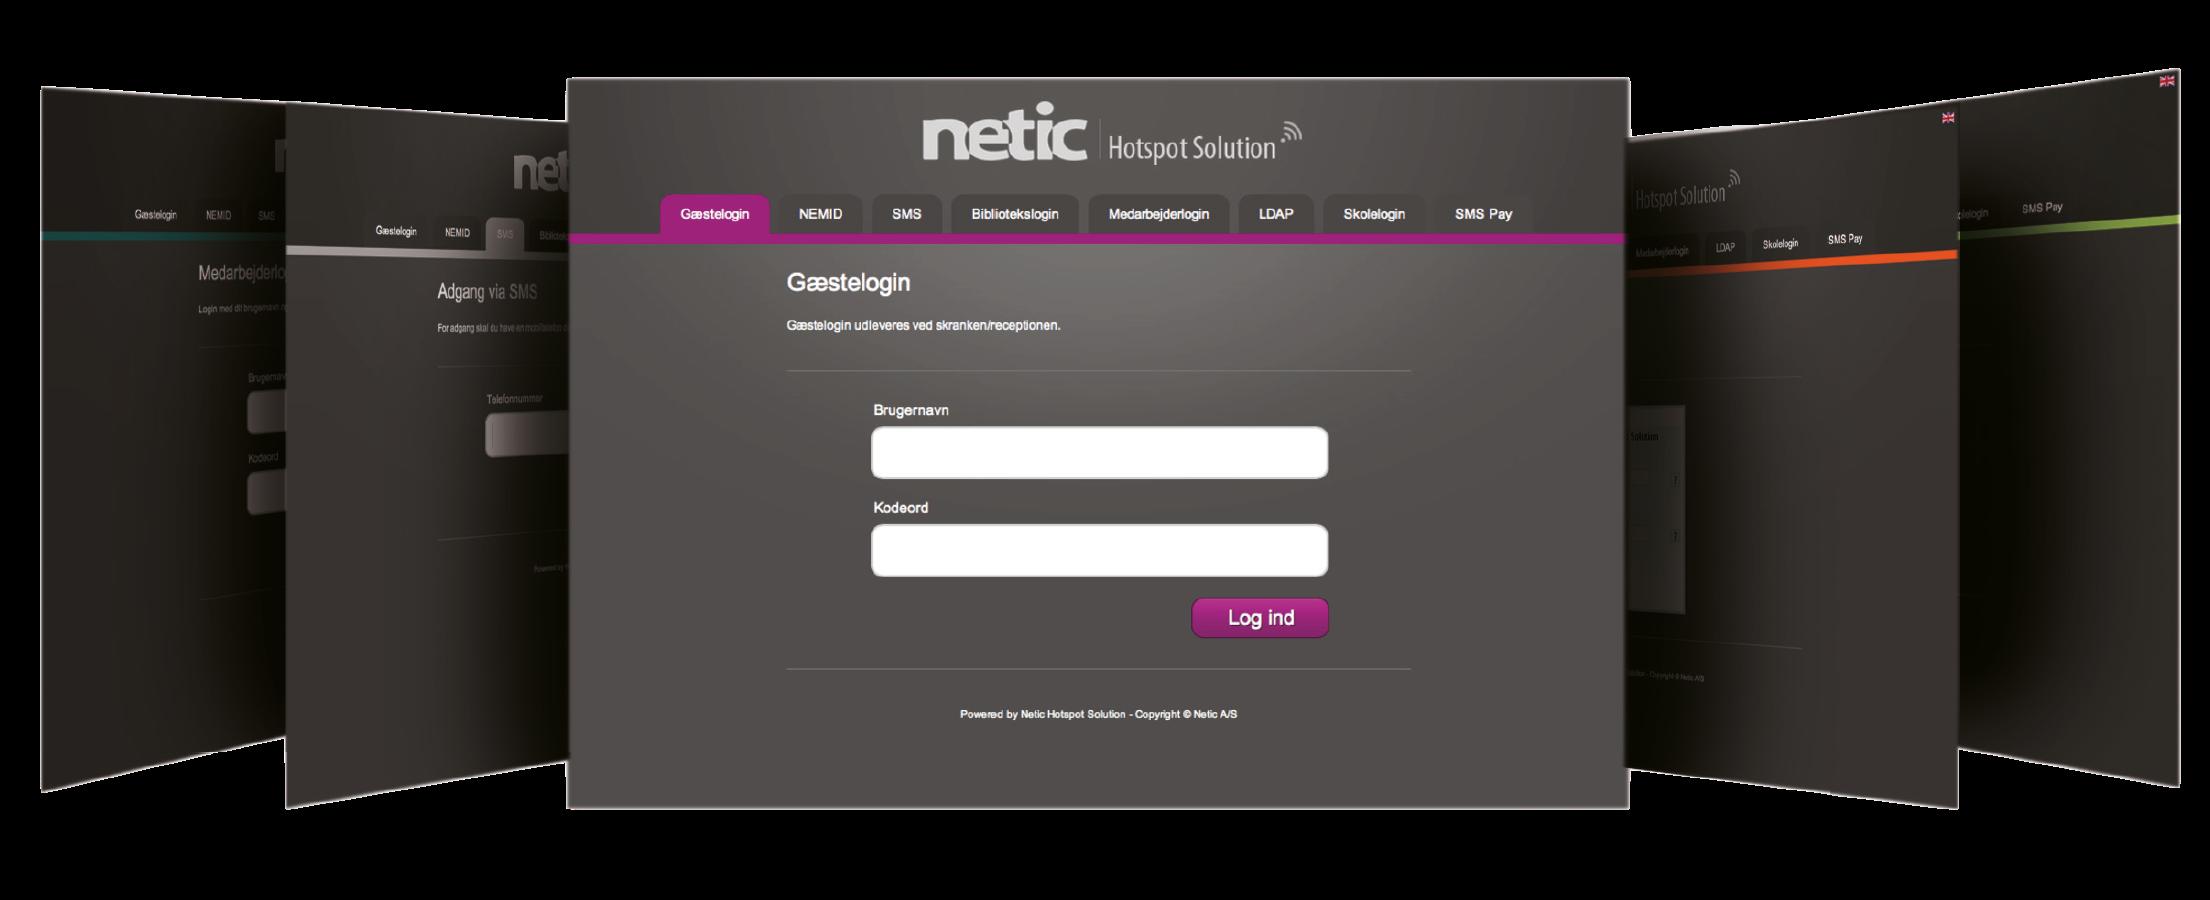 Netic Hotspot Solution